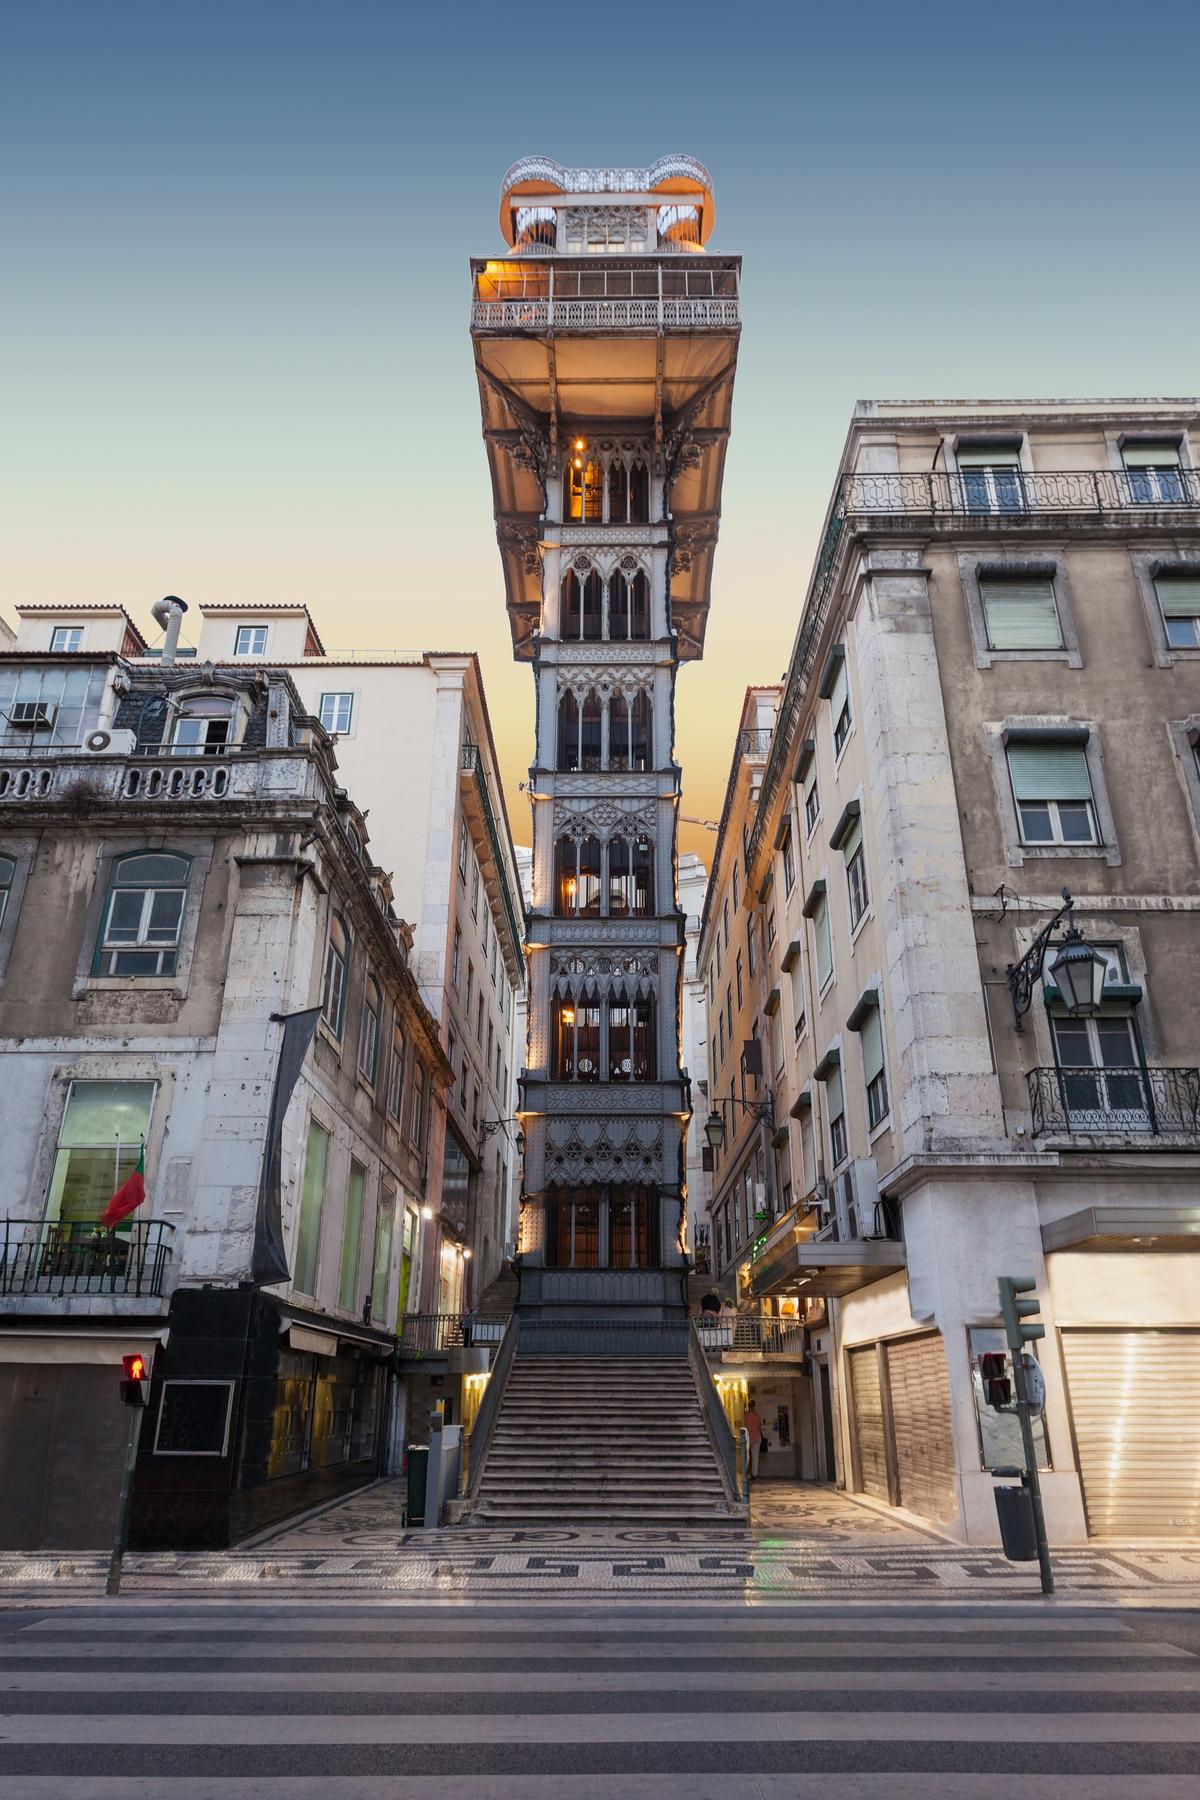 Elevador de Santa Justa - Sehenswürdigkeiten in Lissabon